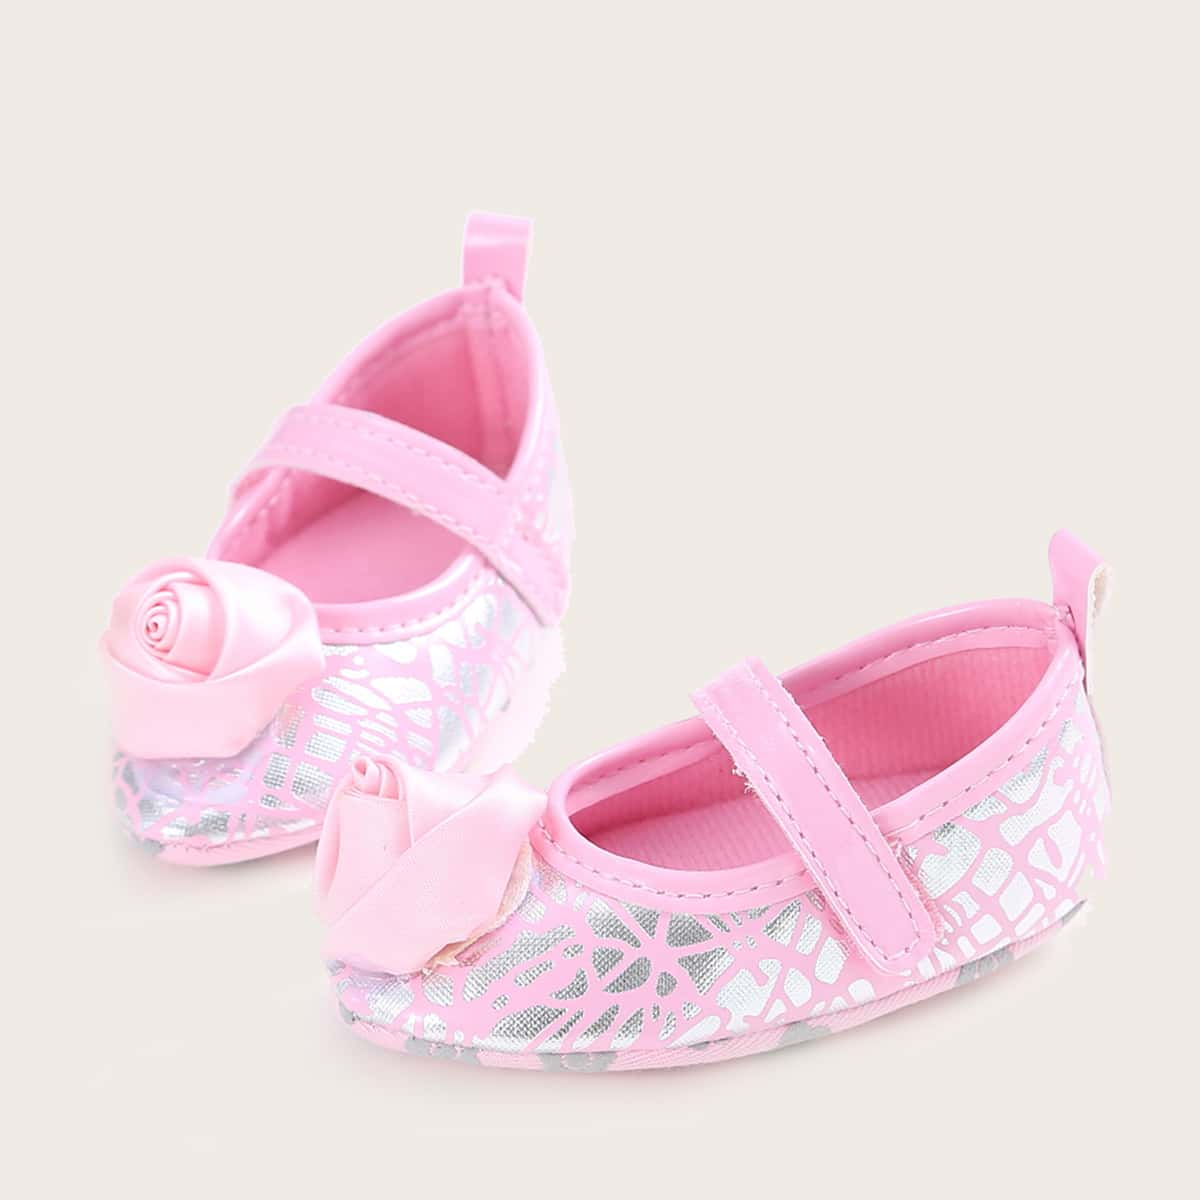 shein Mary Jane Bloemen Baby platte schoentjes